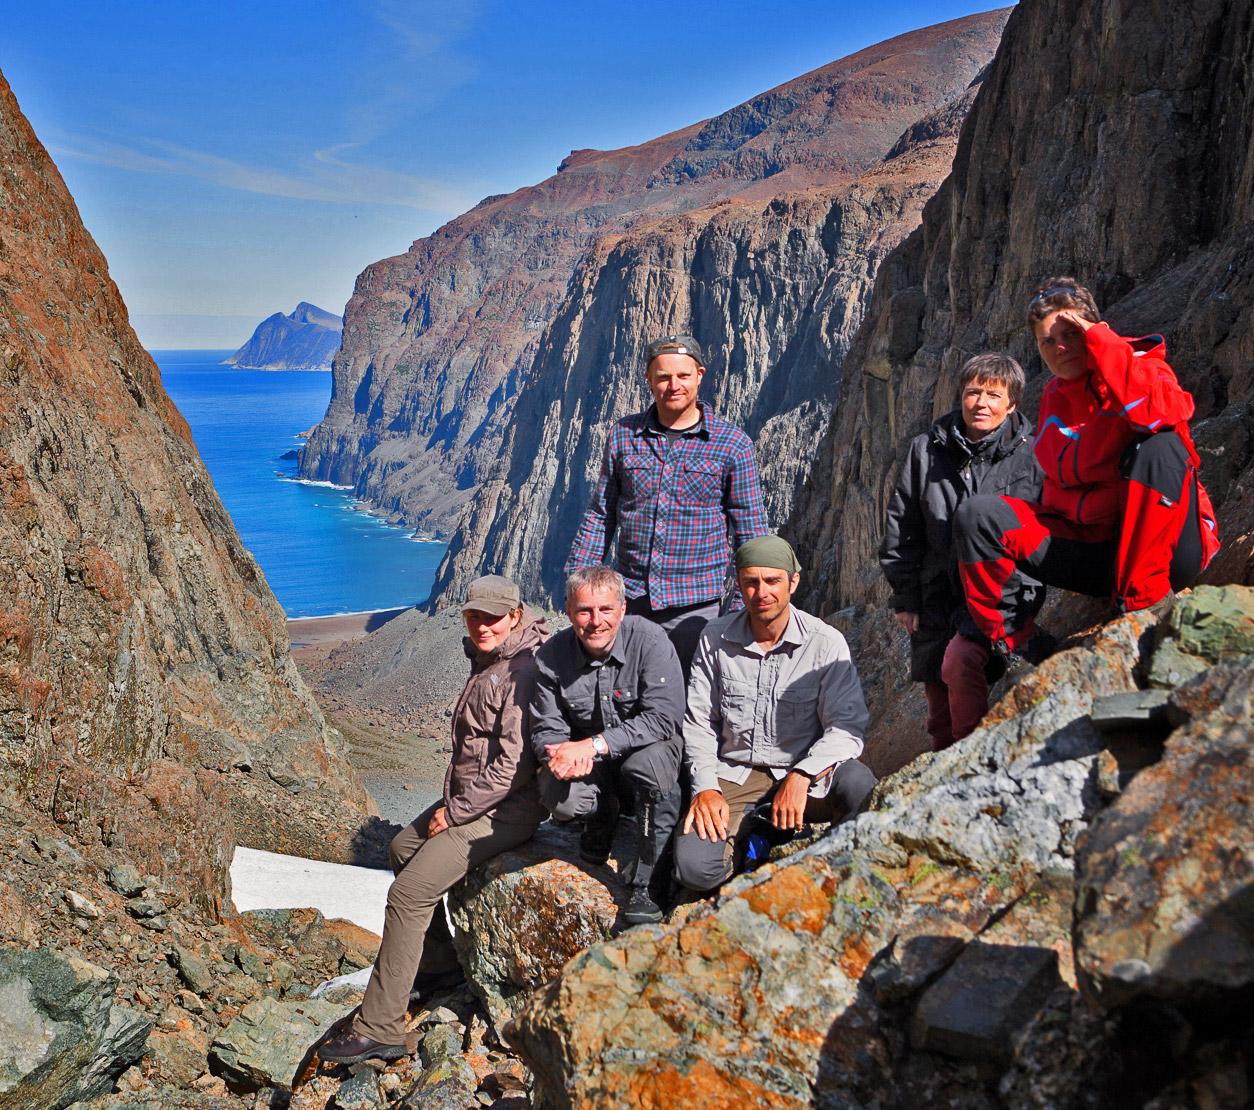 Trekking in Labrador